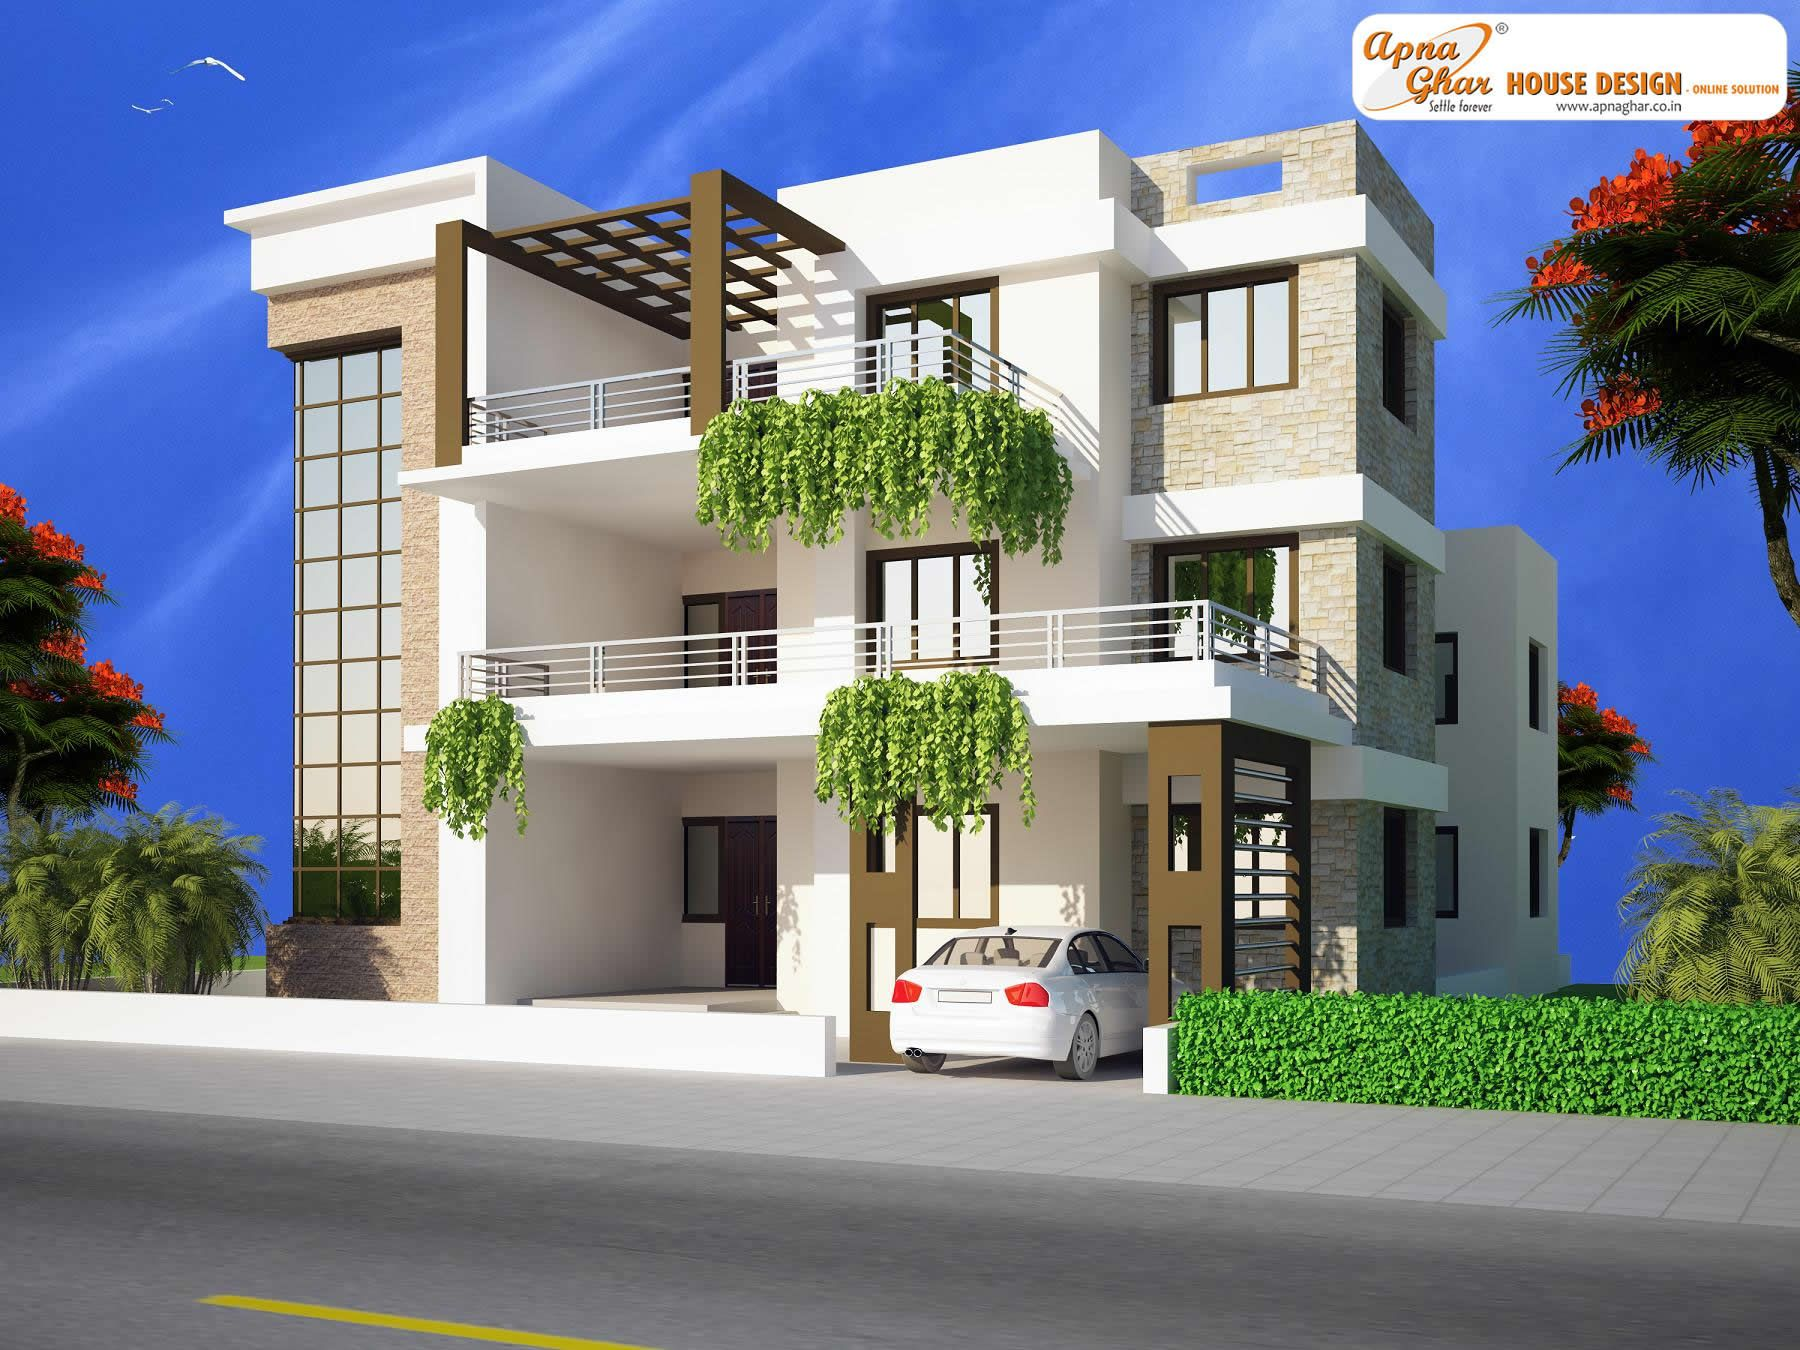 11 bedroom modern triplex 3 floor house design area for Modern triplex house plans